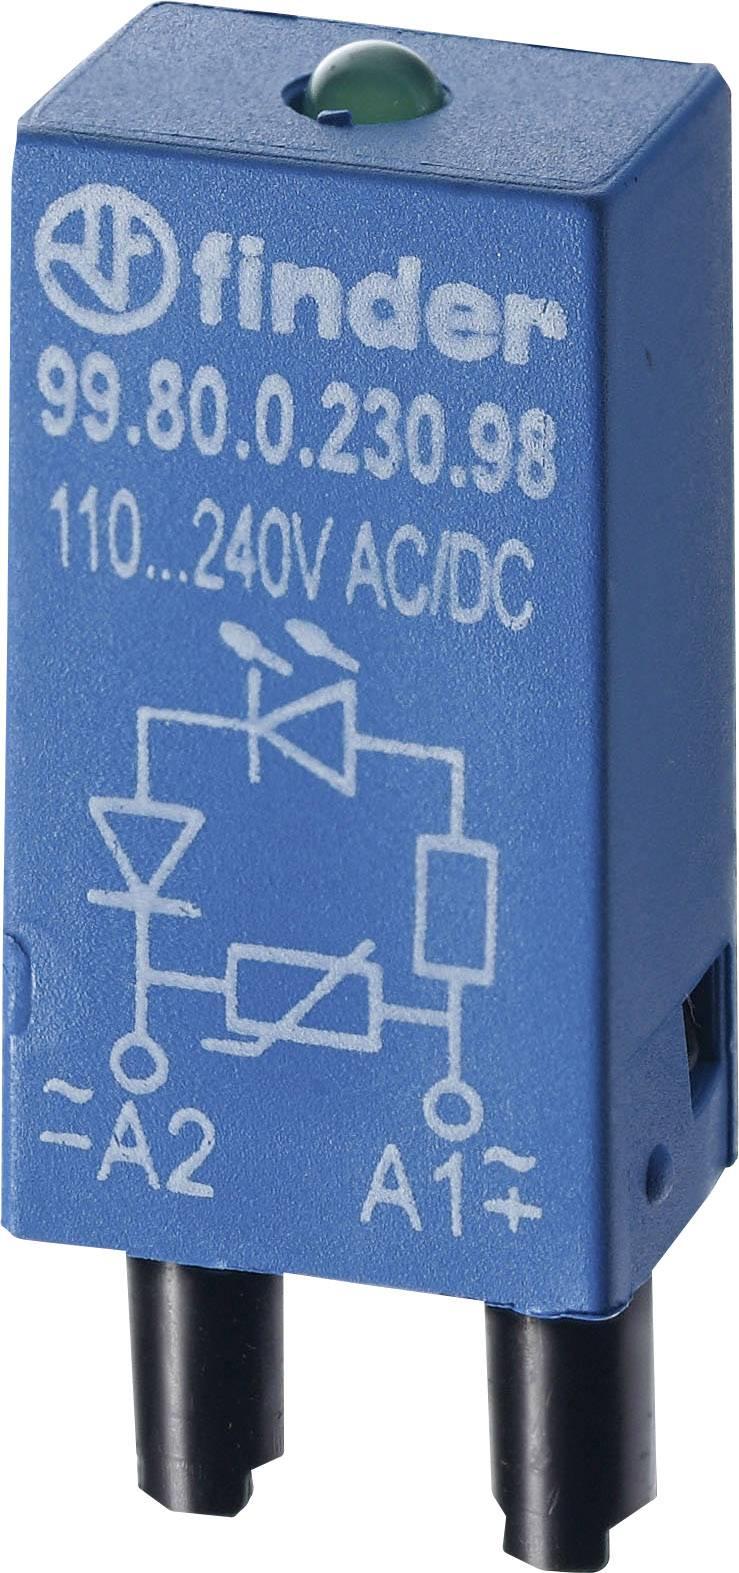 Zásuvný modul s dioidou Finder 99.80.0.230.98 Farba svetla: zelená 1 ks